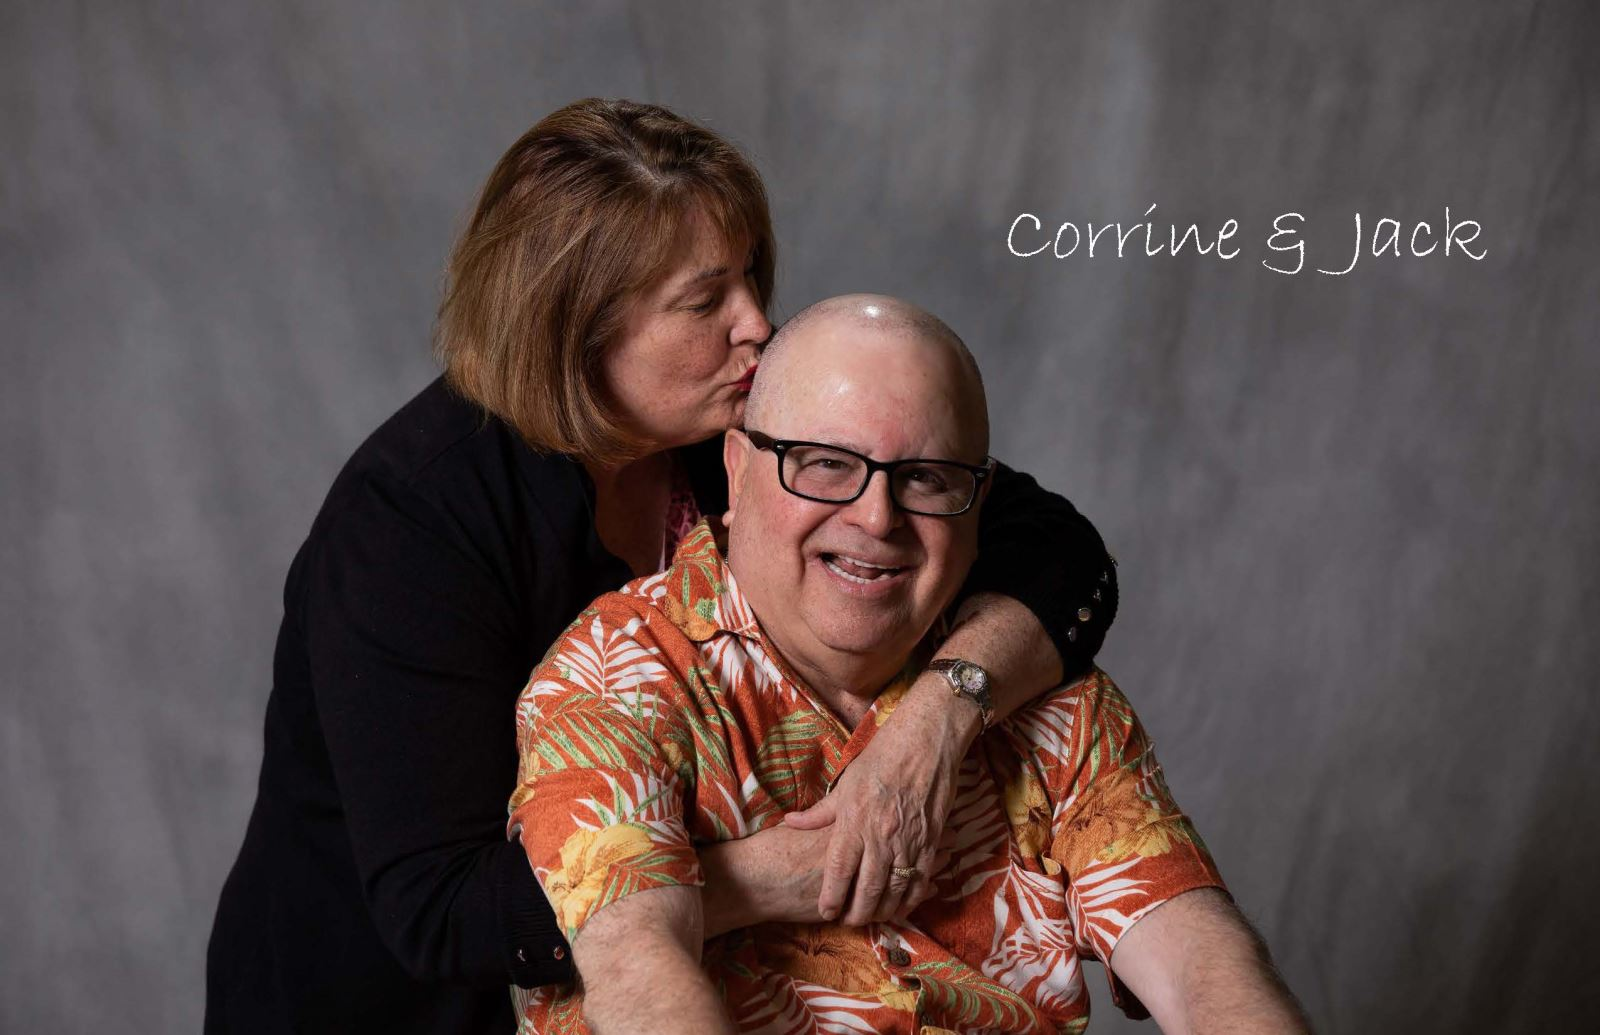 Corrine and Jack